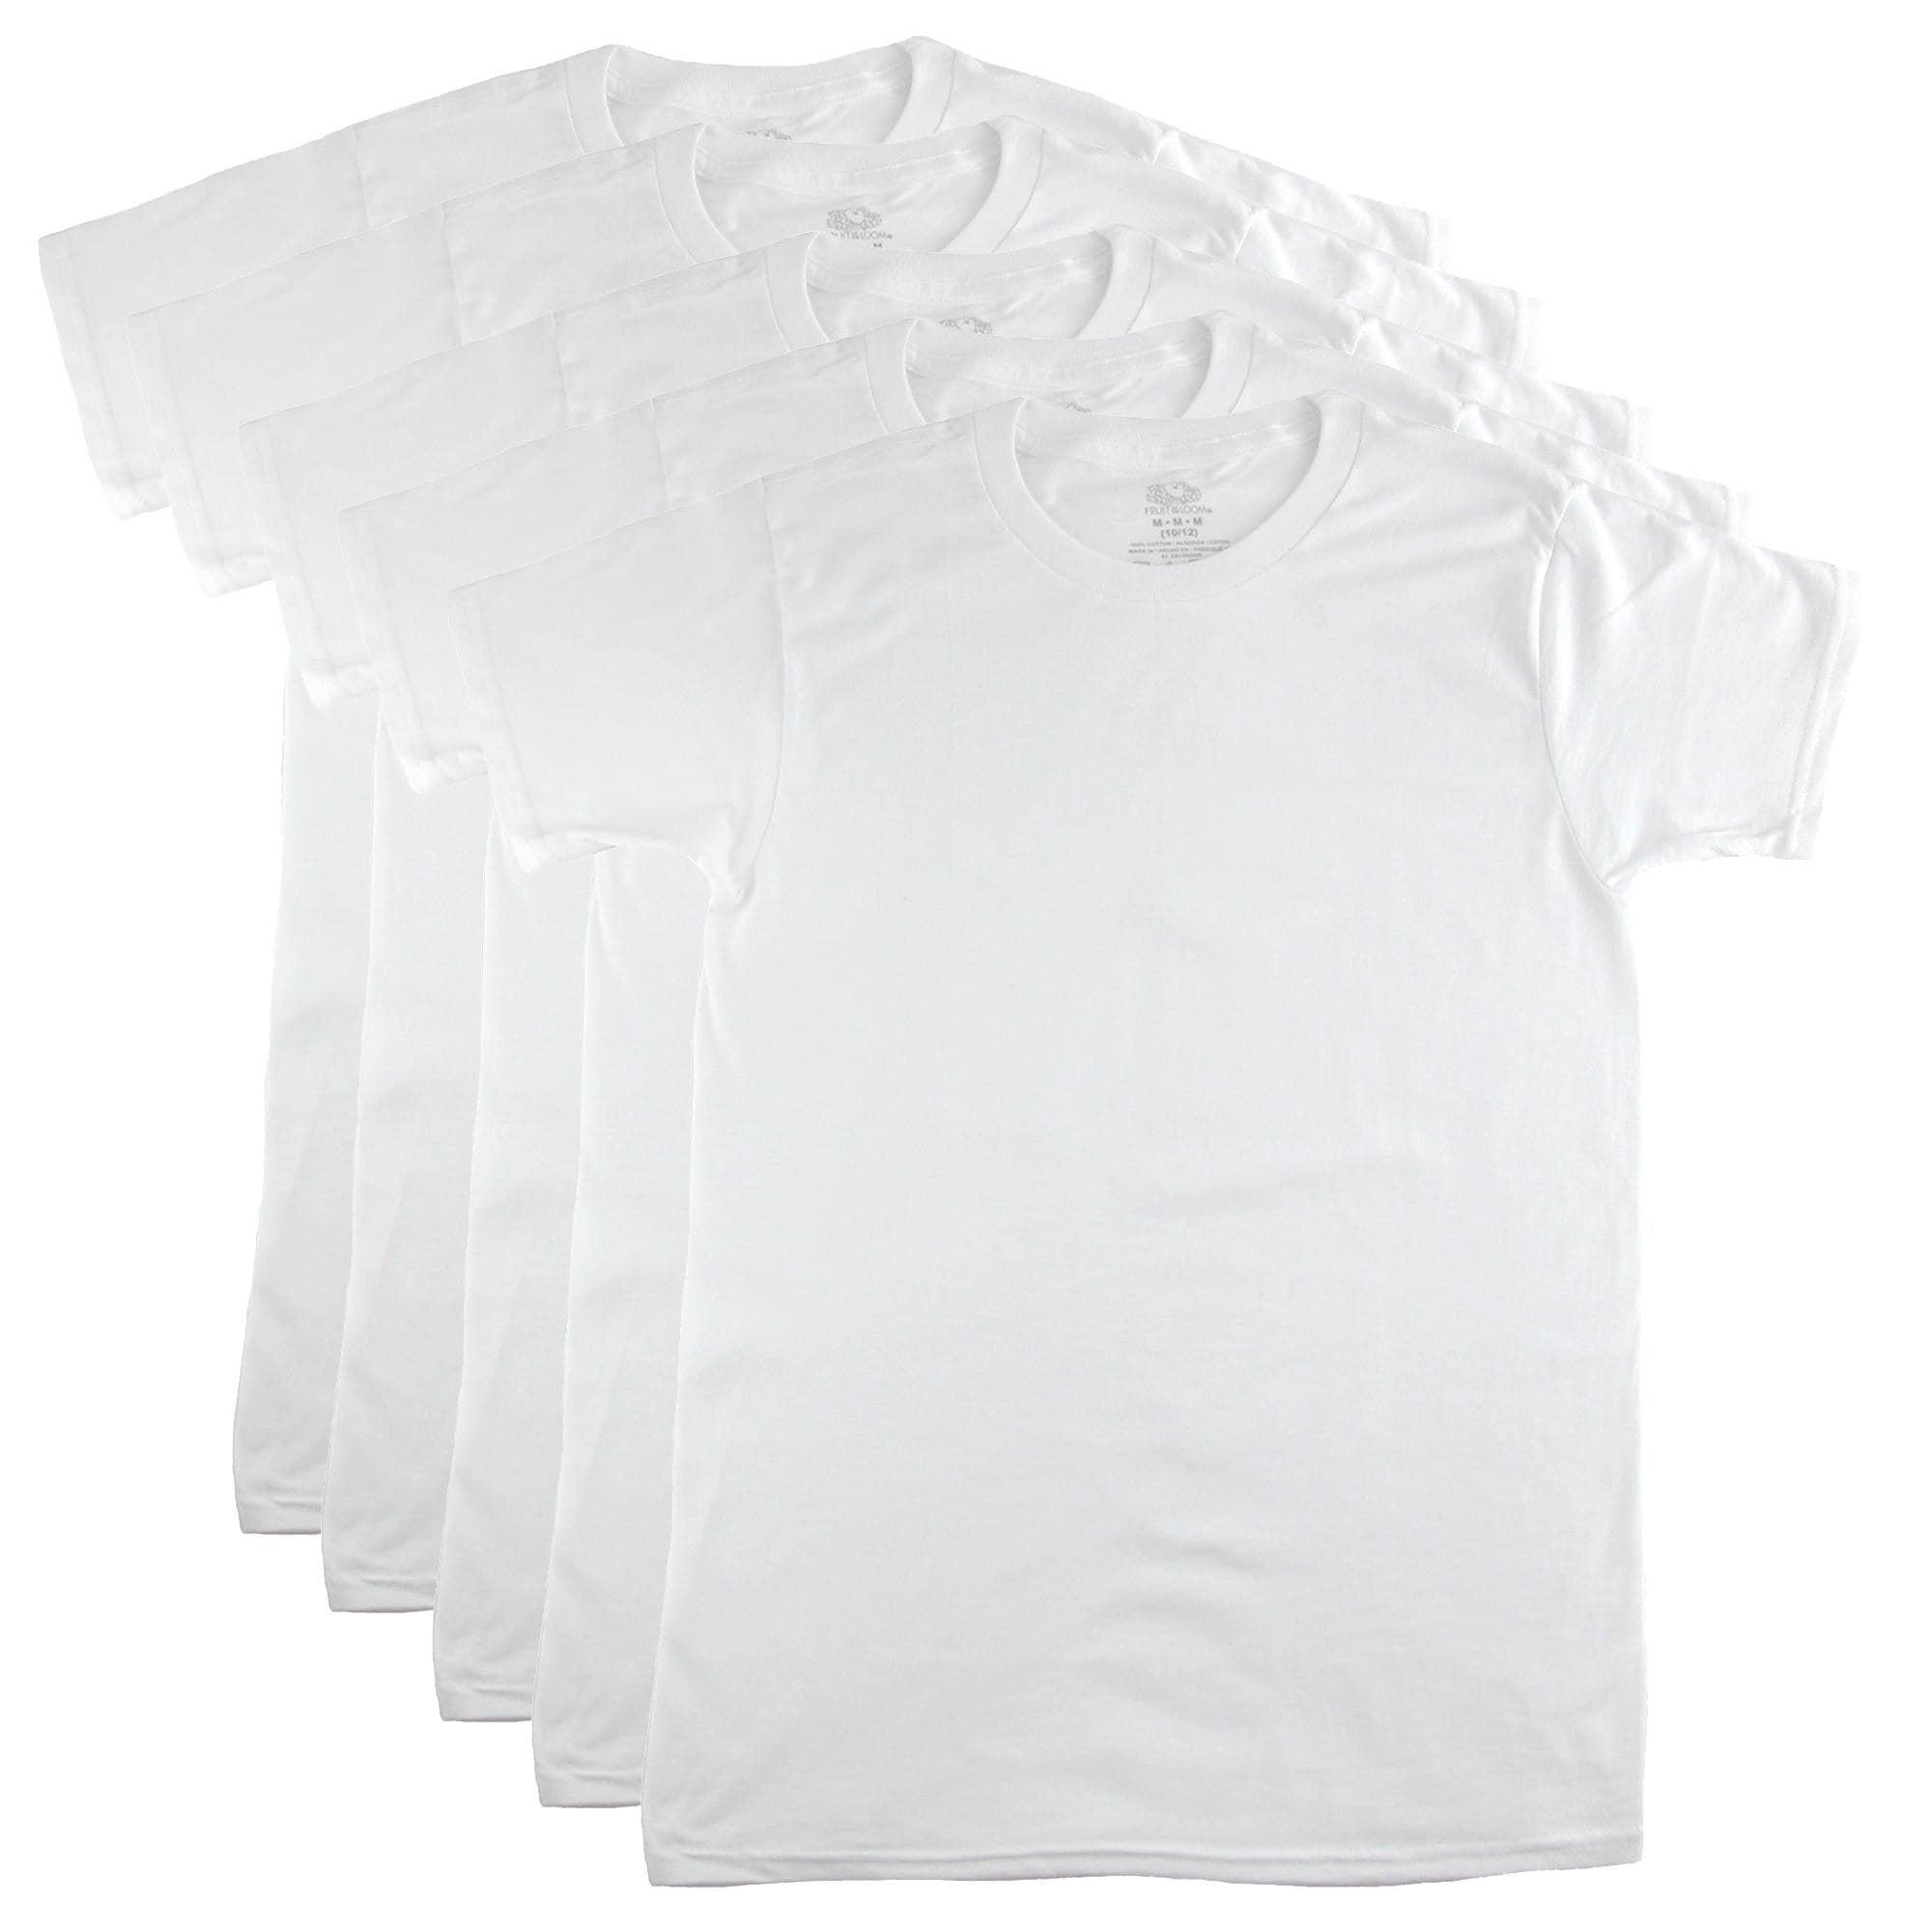 Fruit of the Loom Boys 4Pack Boys Kids Asstd Crew-Neck T-Shirts Undershirts 4P525C